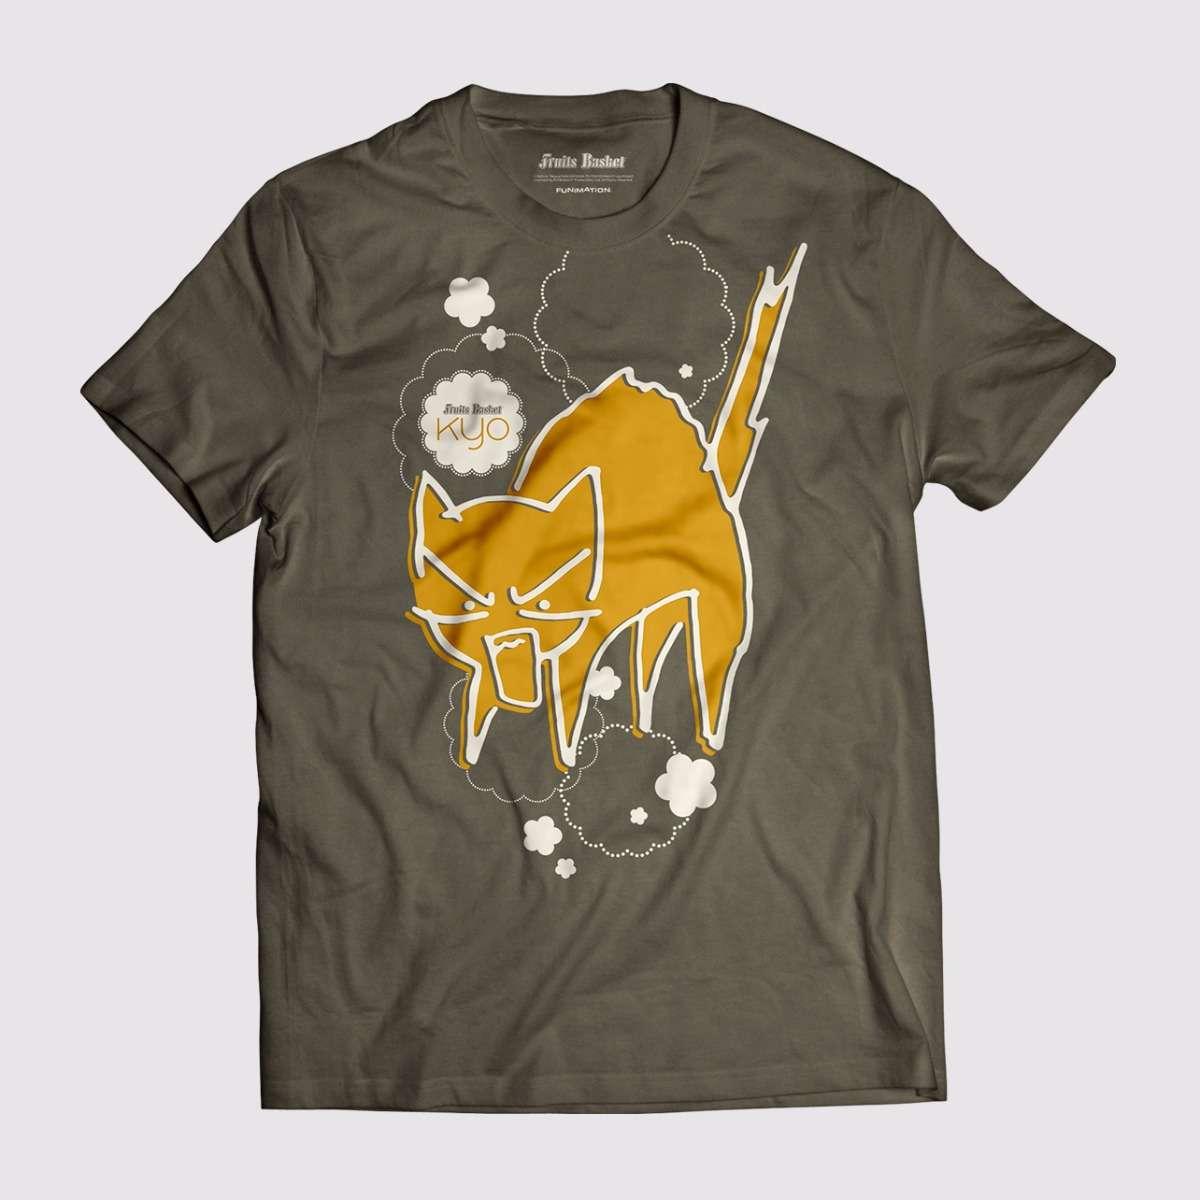 T-shirt - Brown apparel